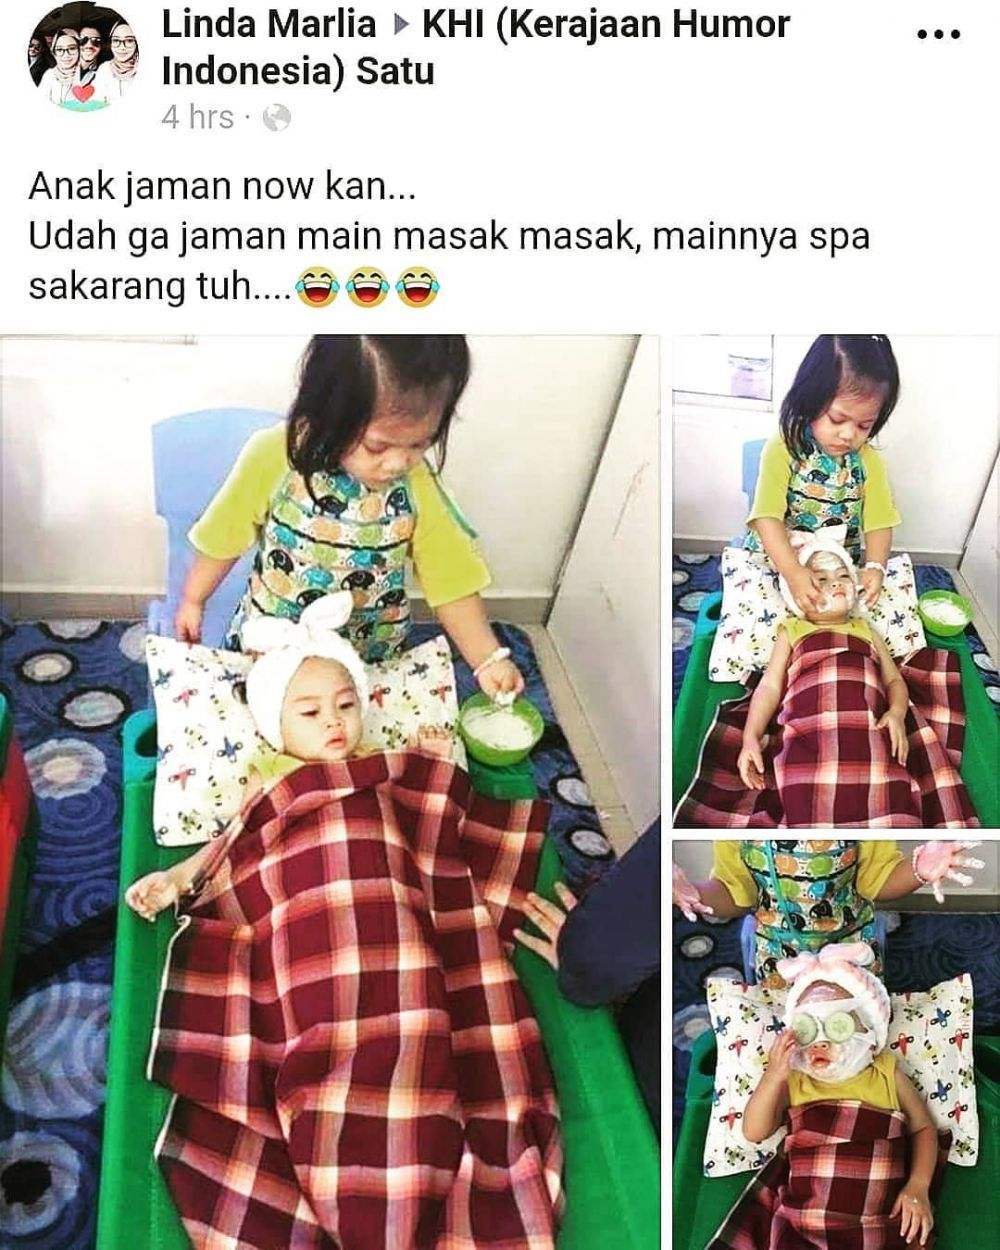 kelakuan usil anak kecil geleng kepala © berbagai sumber